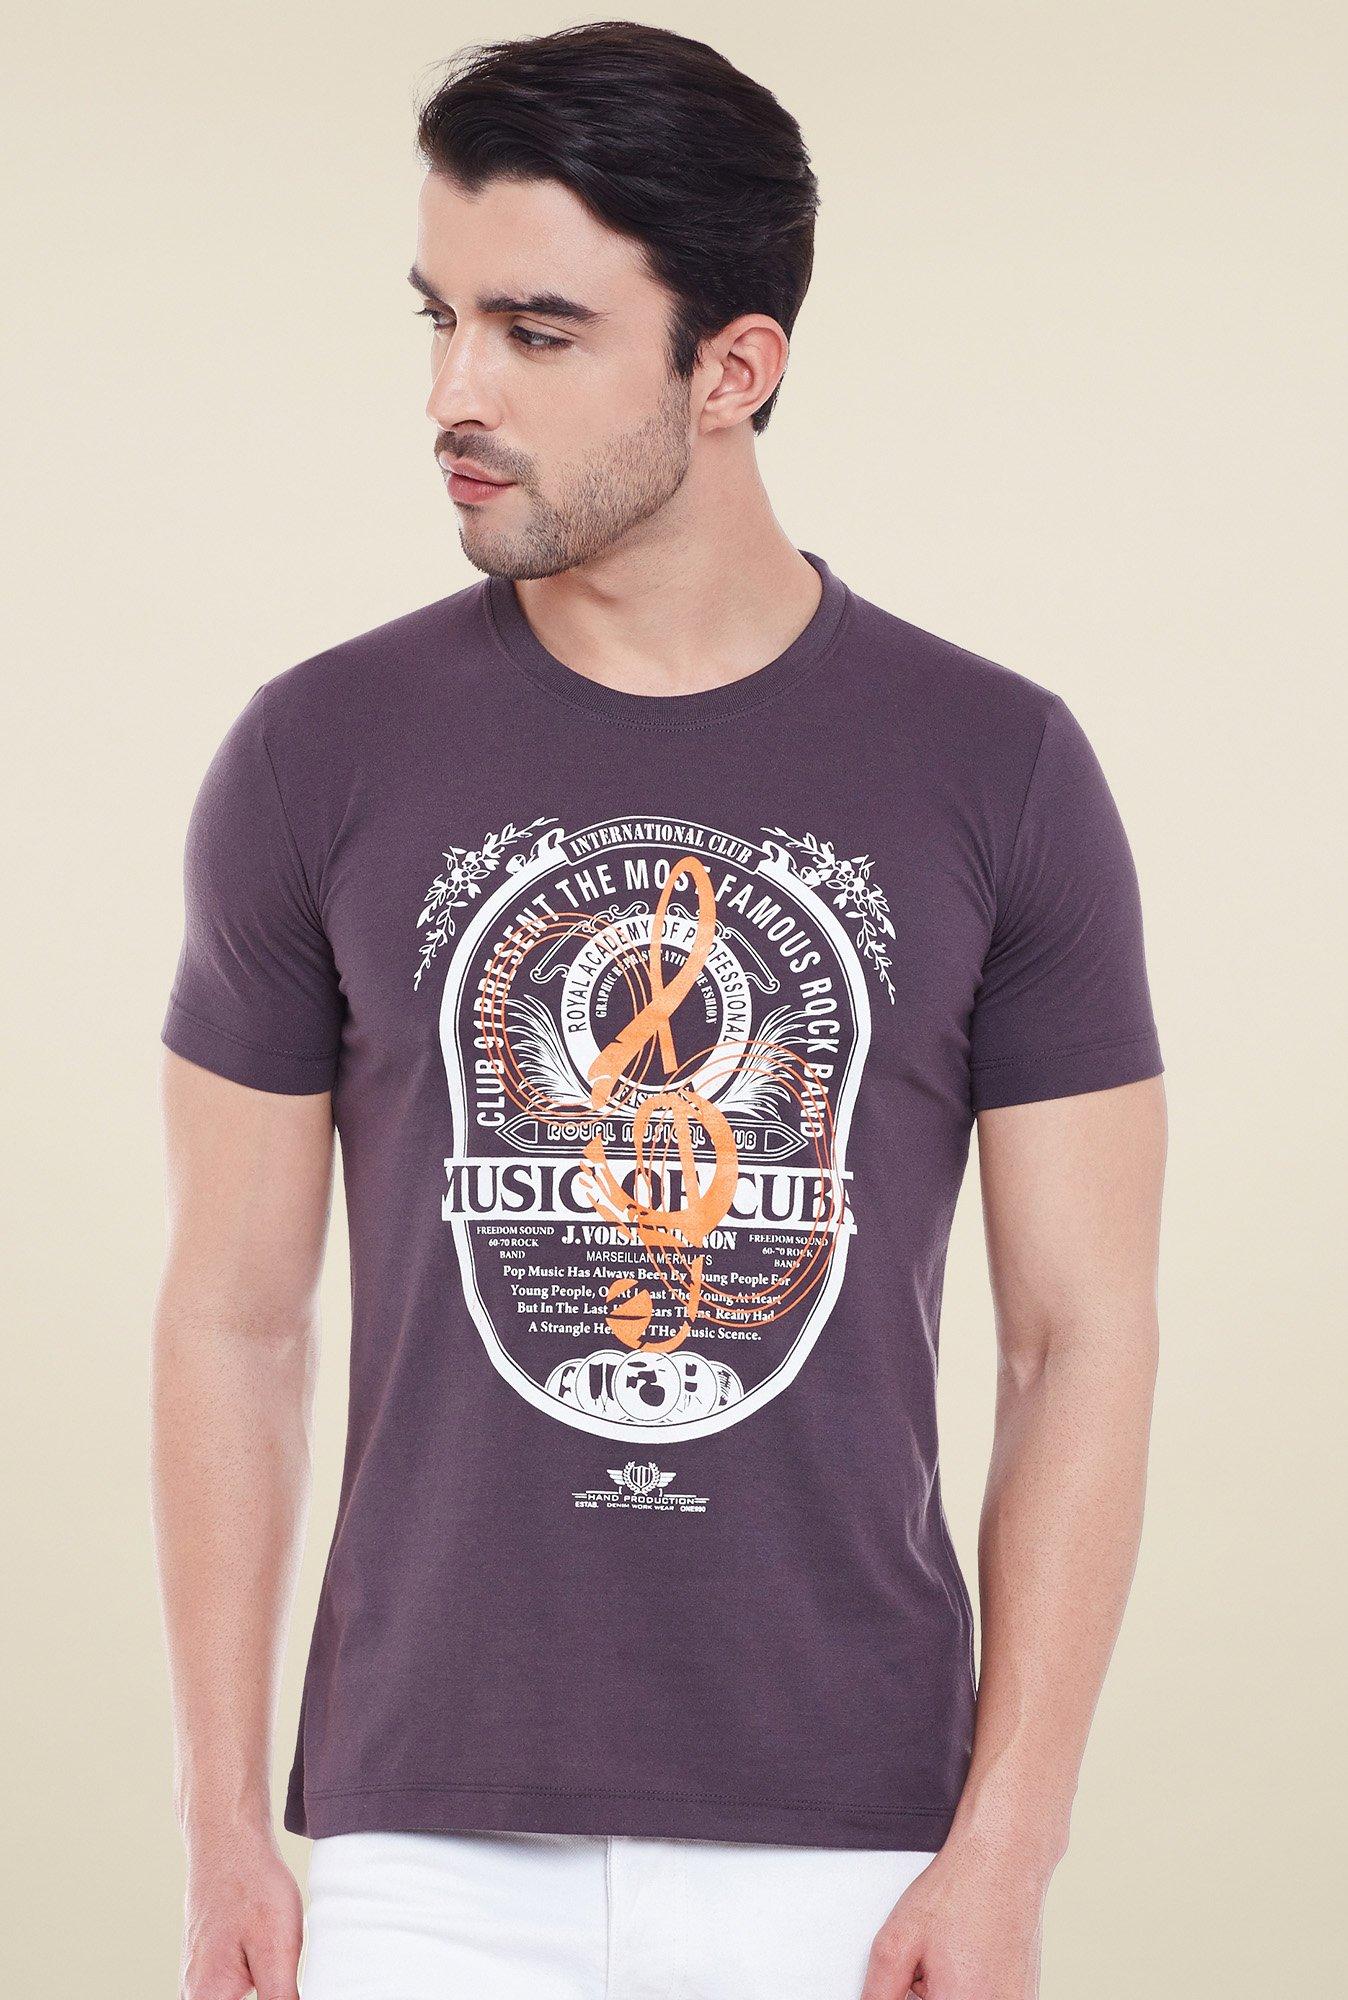 399d88073a94 Music T Shirts Online India - DREAMWORKS